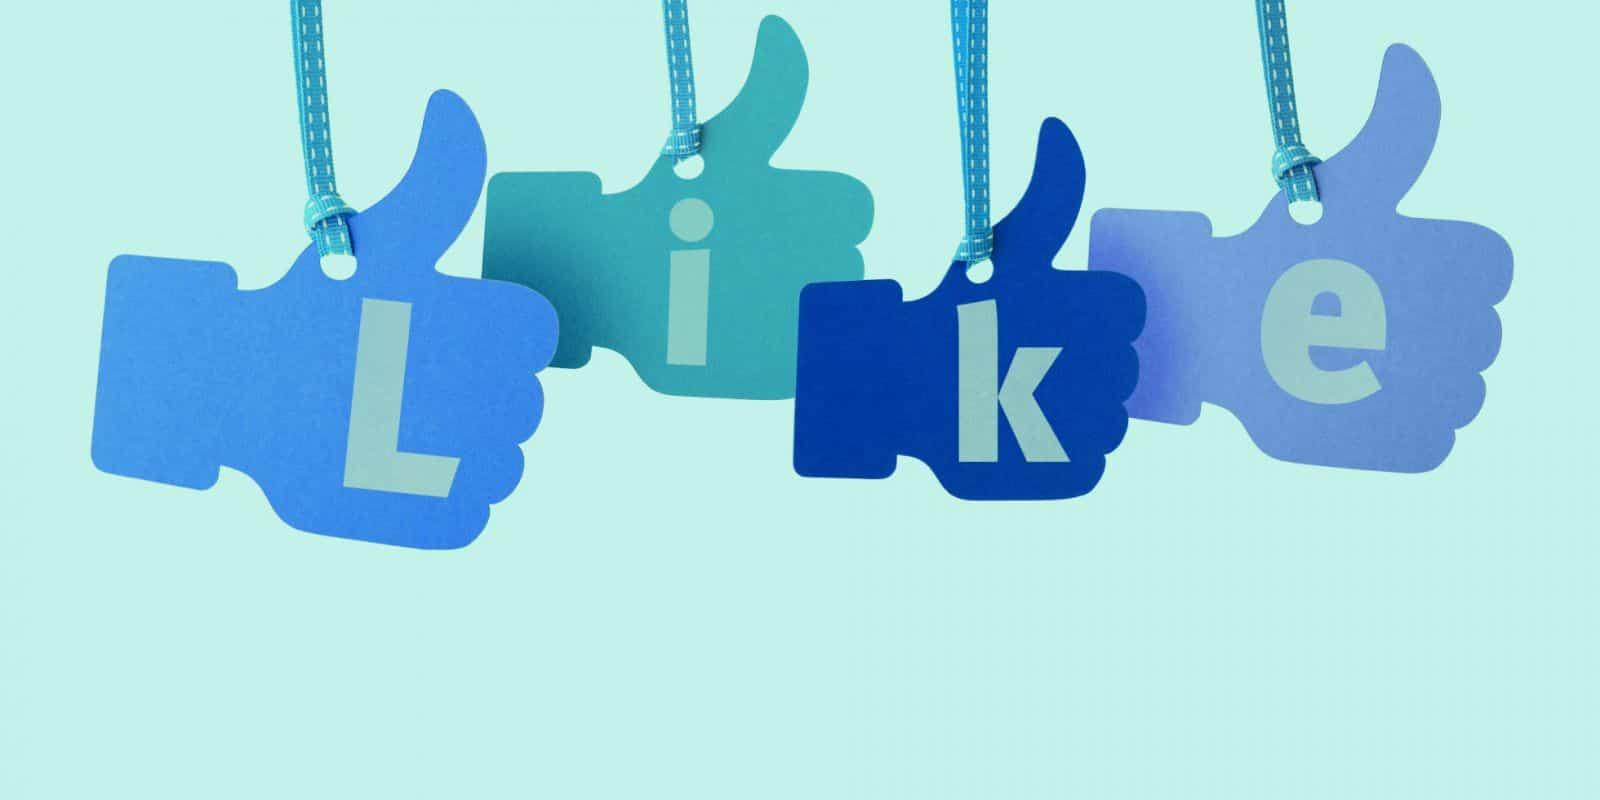 facebook20like20social20network - آتلیه عکاسی اندیشه نو در شبکه های ویژه اینترنتی Social networks